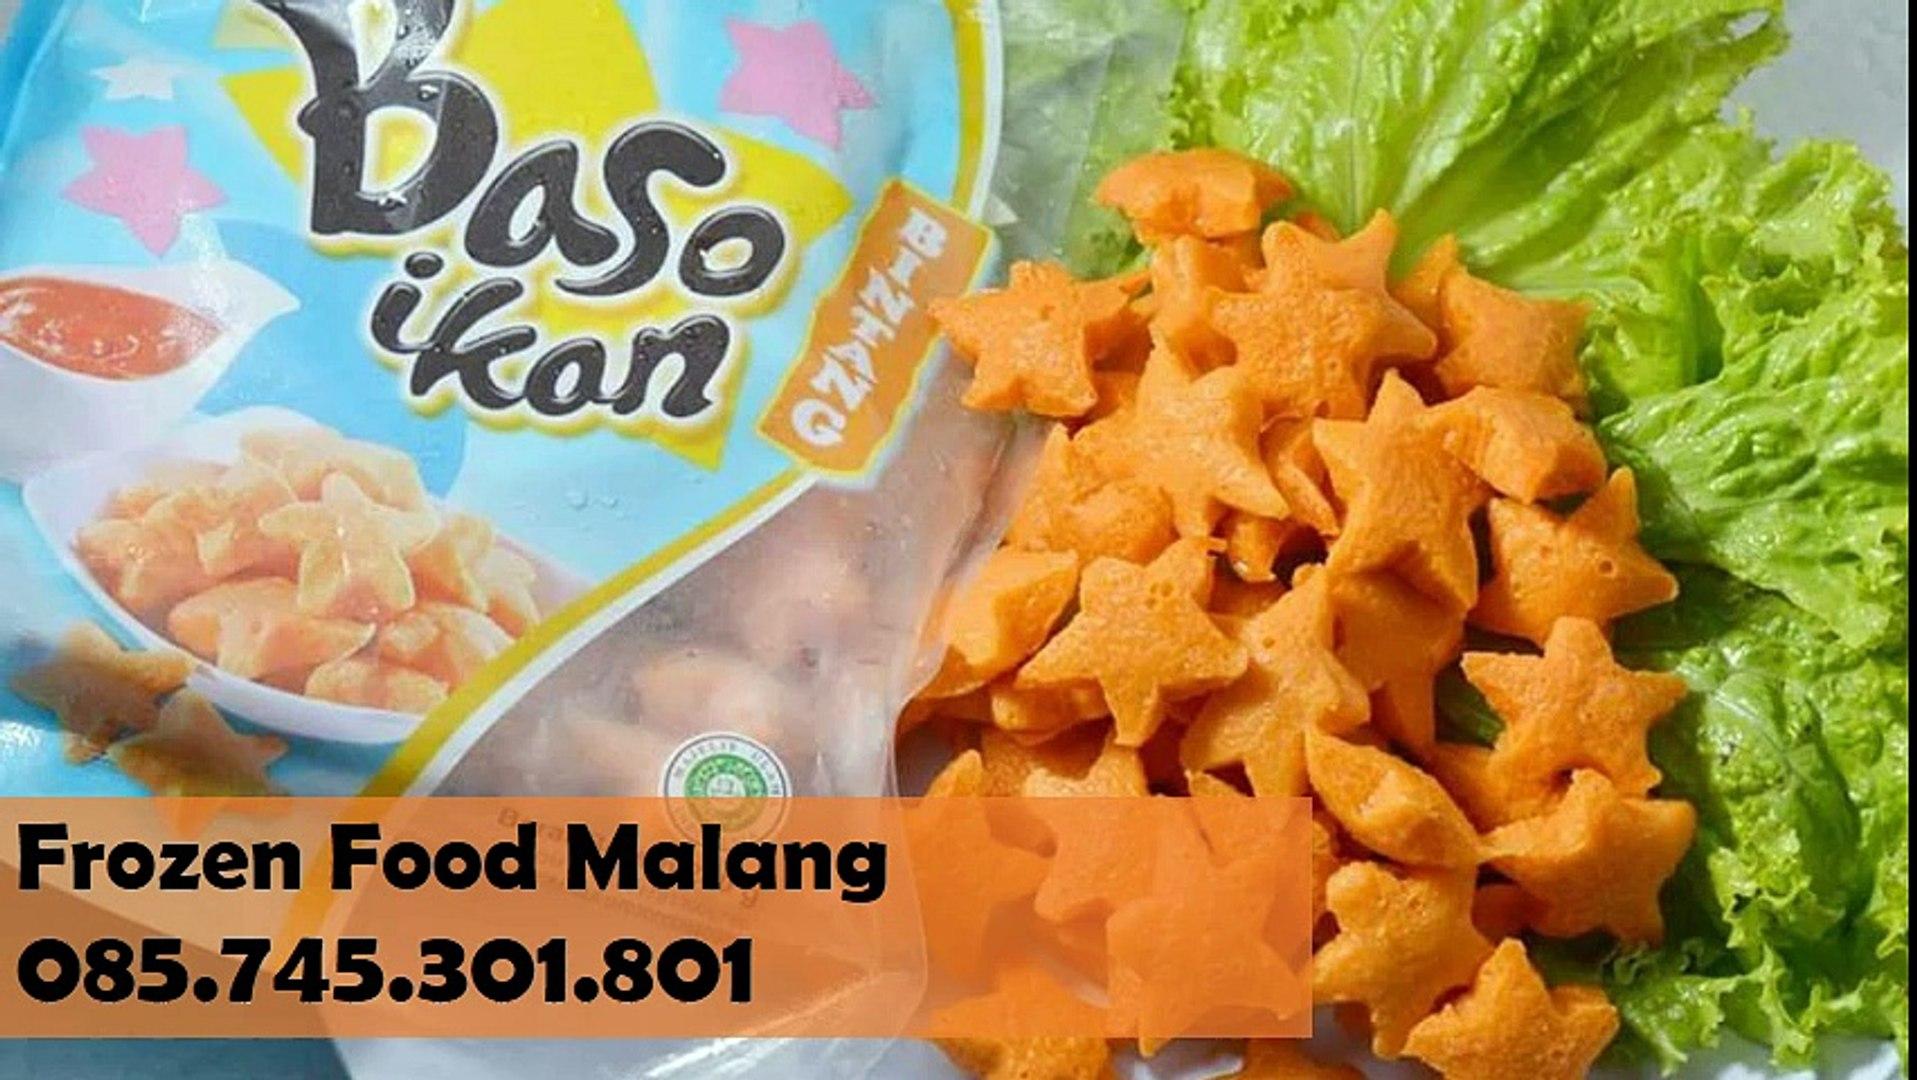 085 745 301 801 Distributor Frozen Food Malang Agen Frozen Food Malang Toko Frozen Food Malang Video Dailymotion